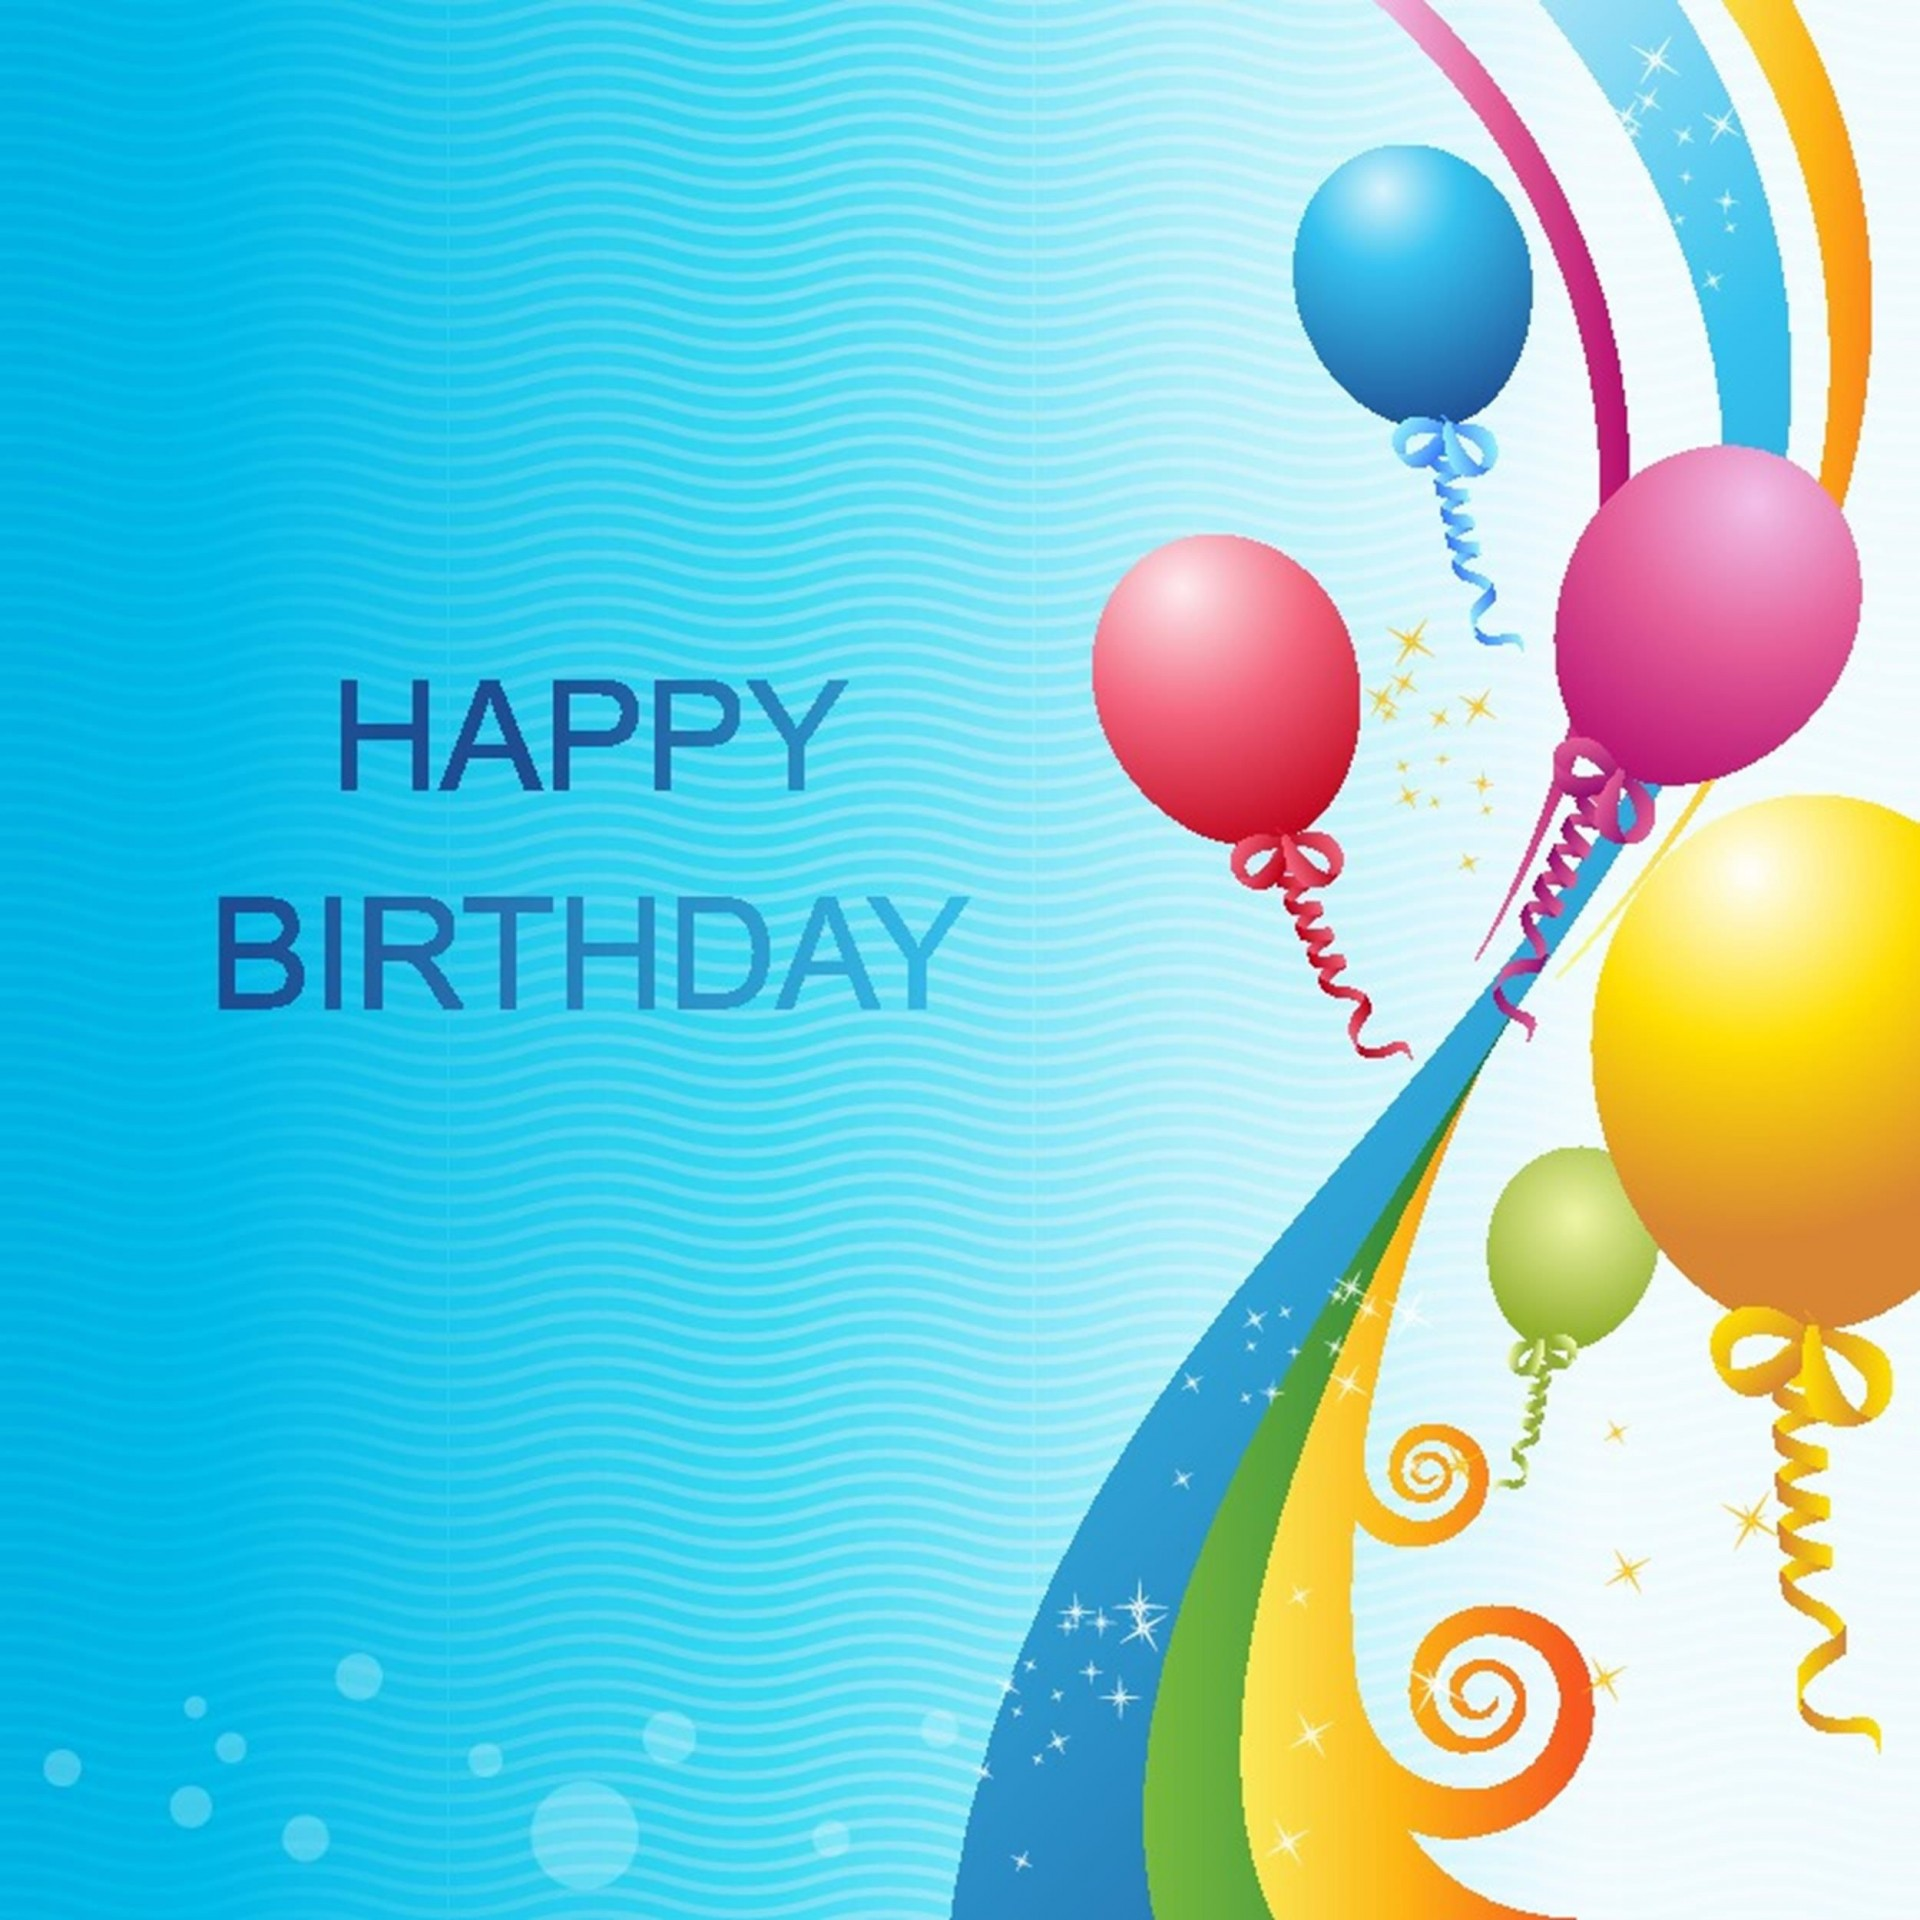 009 Sensational Free Printable Birthday Card Template For Mac High Def 1920